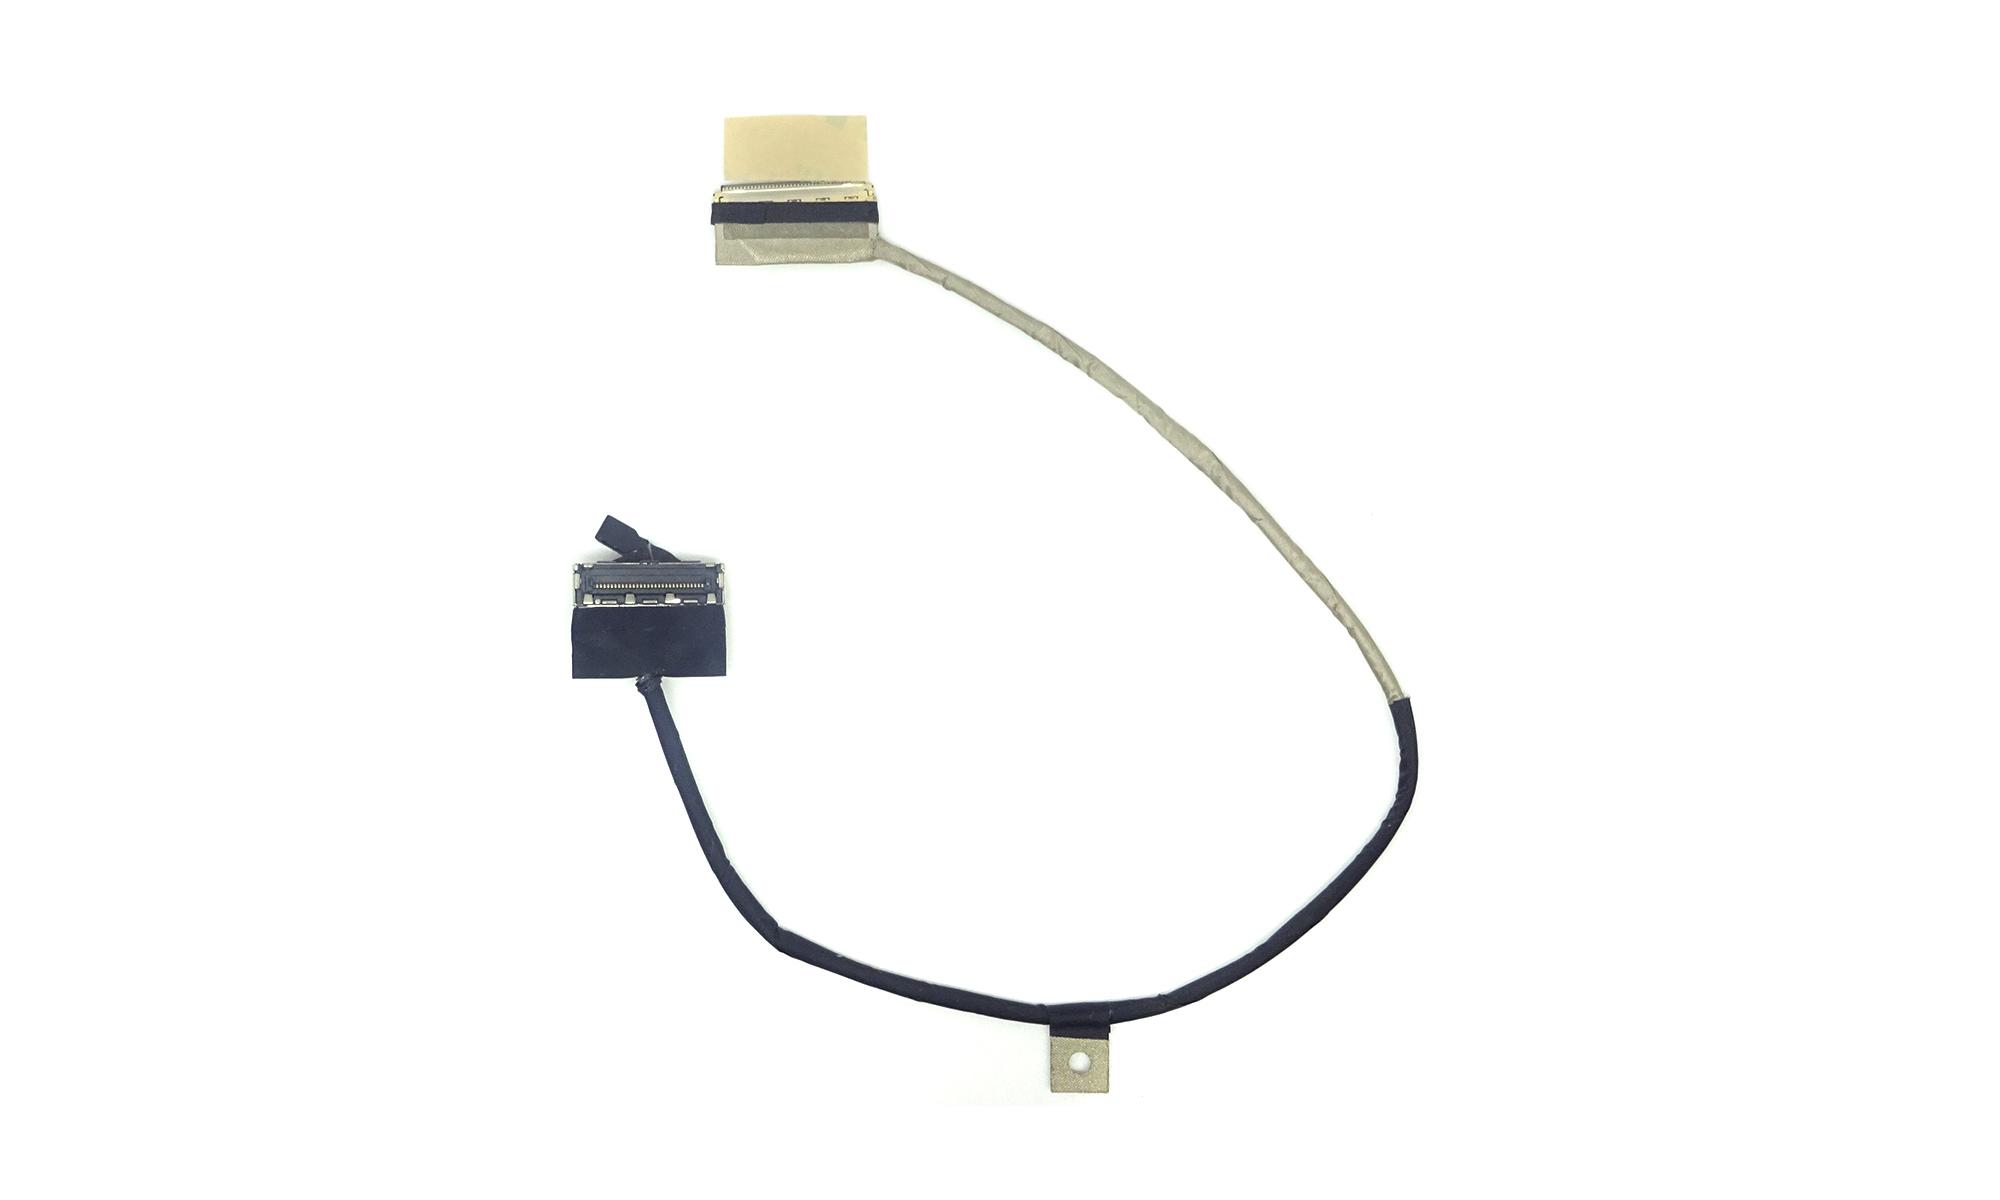 Cablu video Asus ROG Strix Hero II G515GV, G515GW, GL504GM, GL504GS, GL504GV, GL504GW, model 14005-02700100